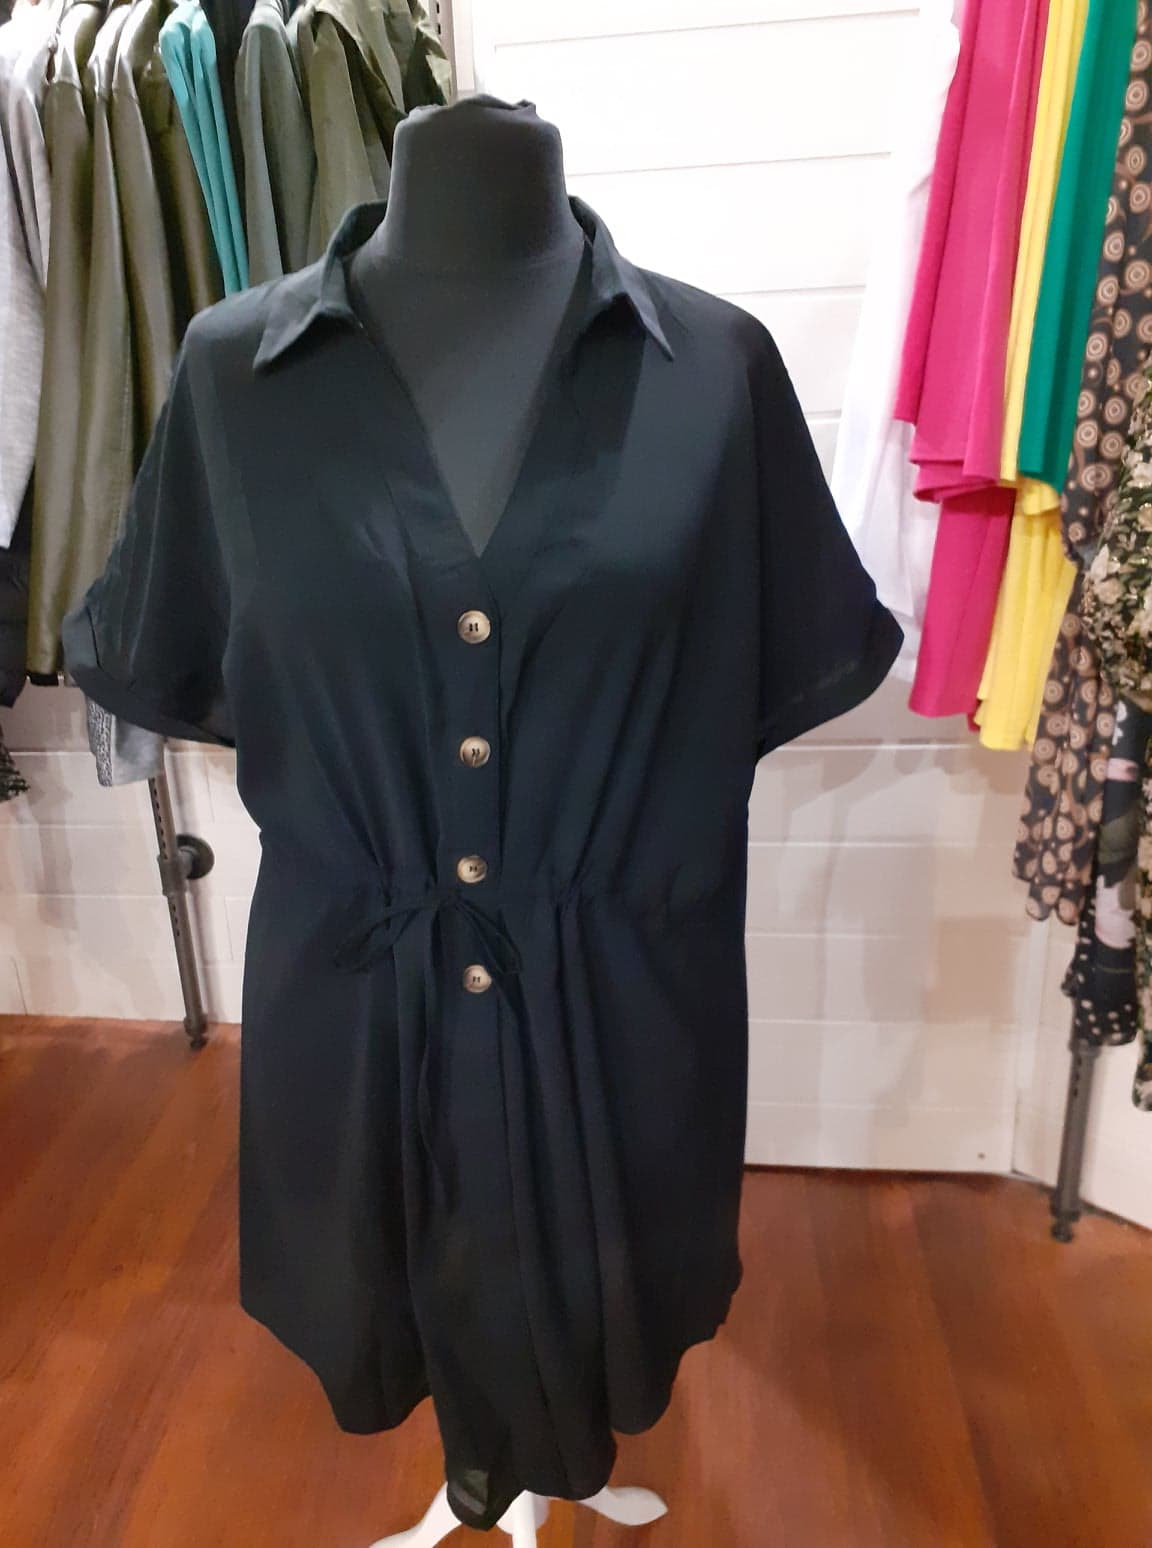 robe noir manche courte boutonné - rob-noi-man-cou-bou